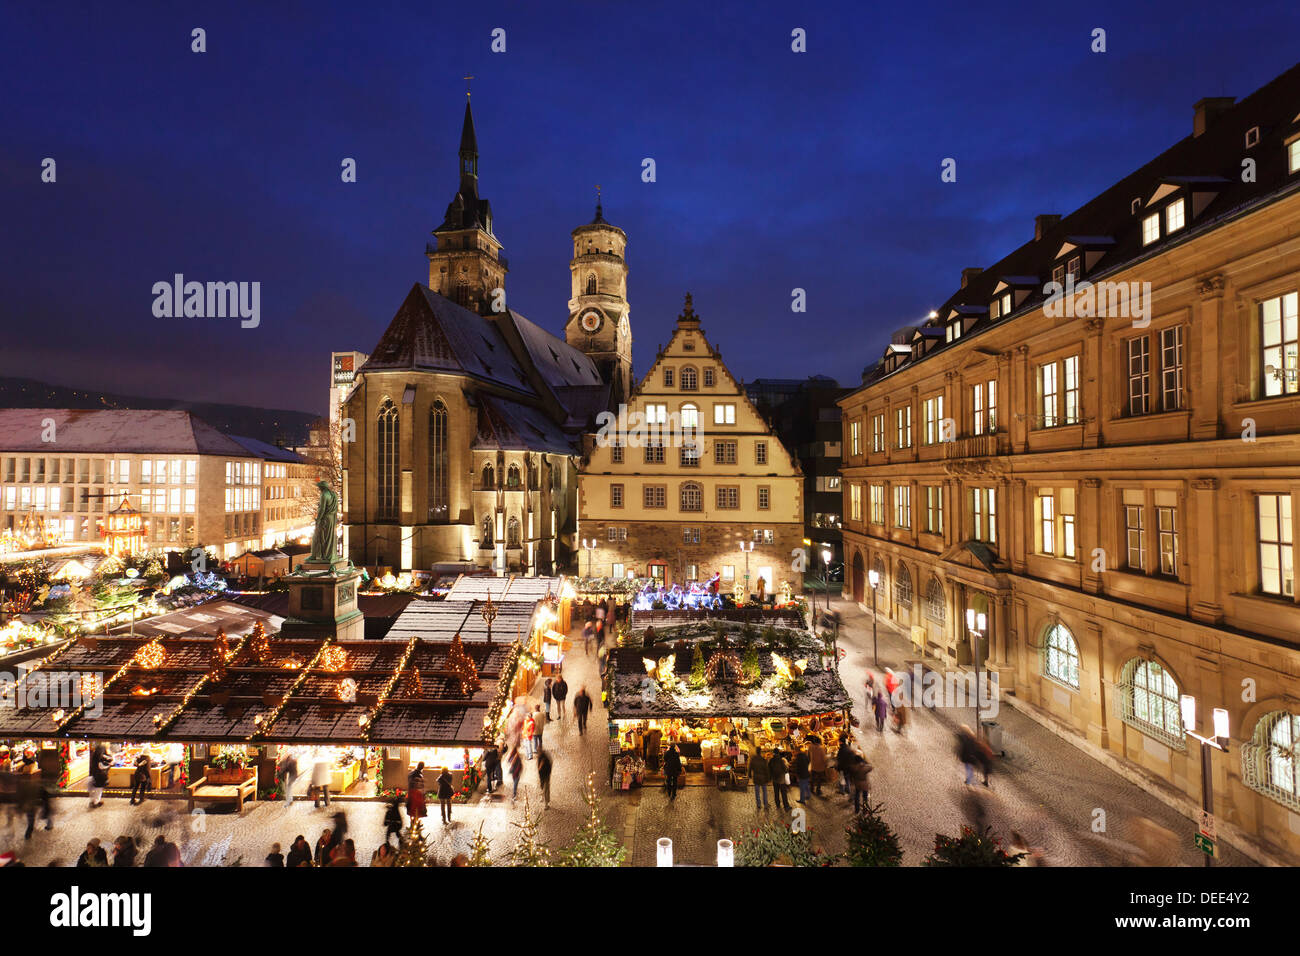 Christmas In Stuttgart Germany.Christmas Fair On Schillerplatz Square With Stiftskirche